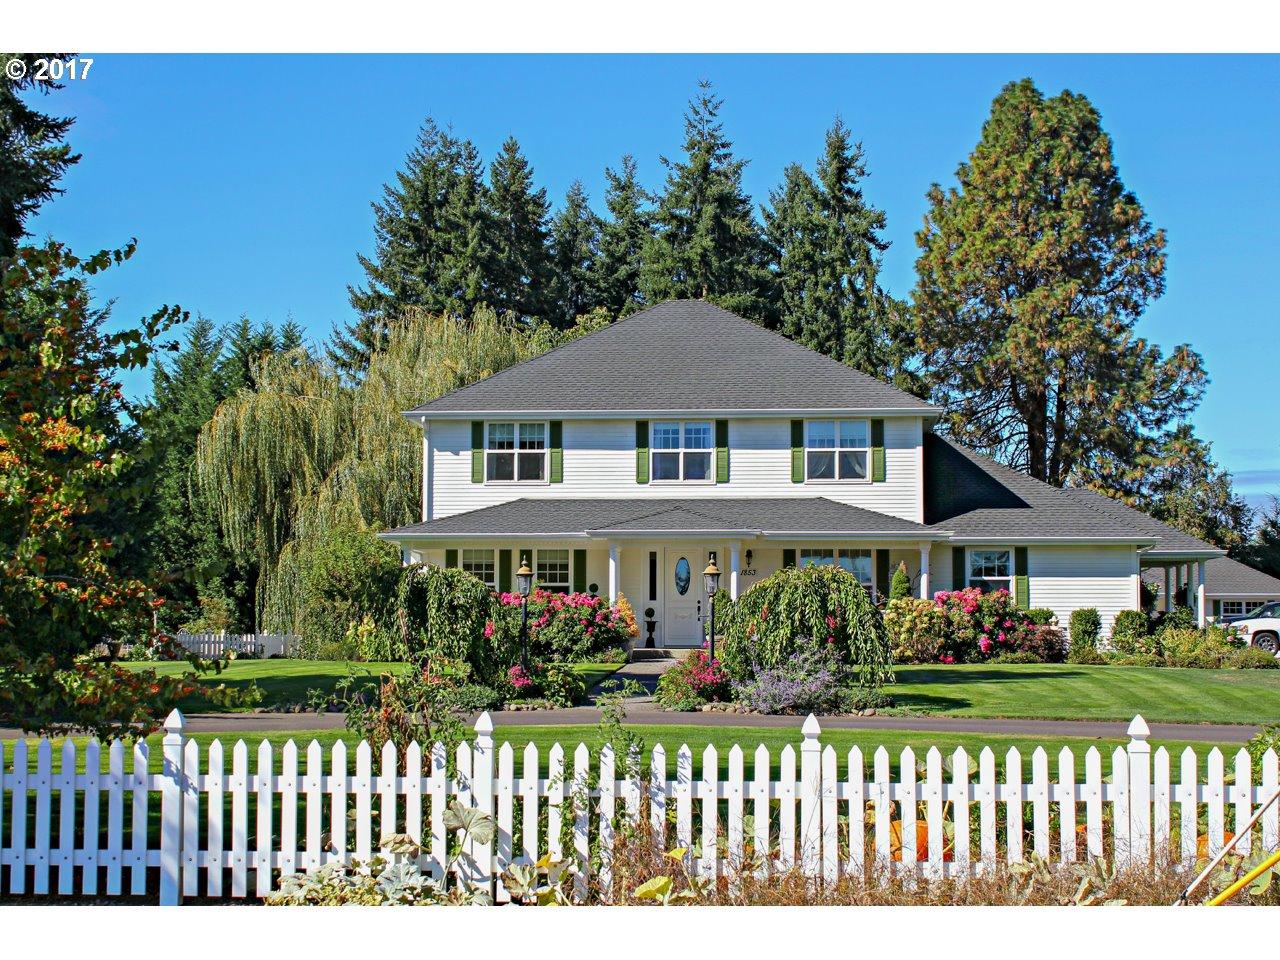 1853 63RD AVE, Salem, OR 97305